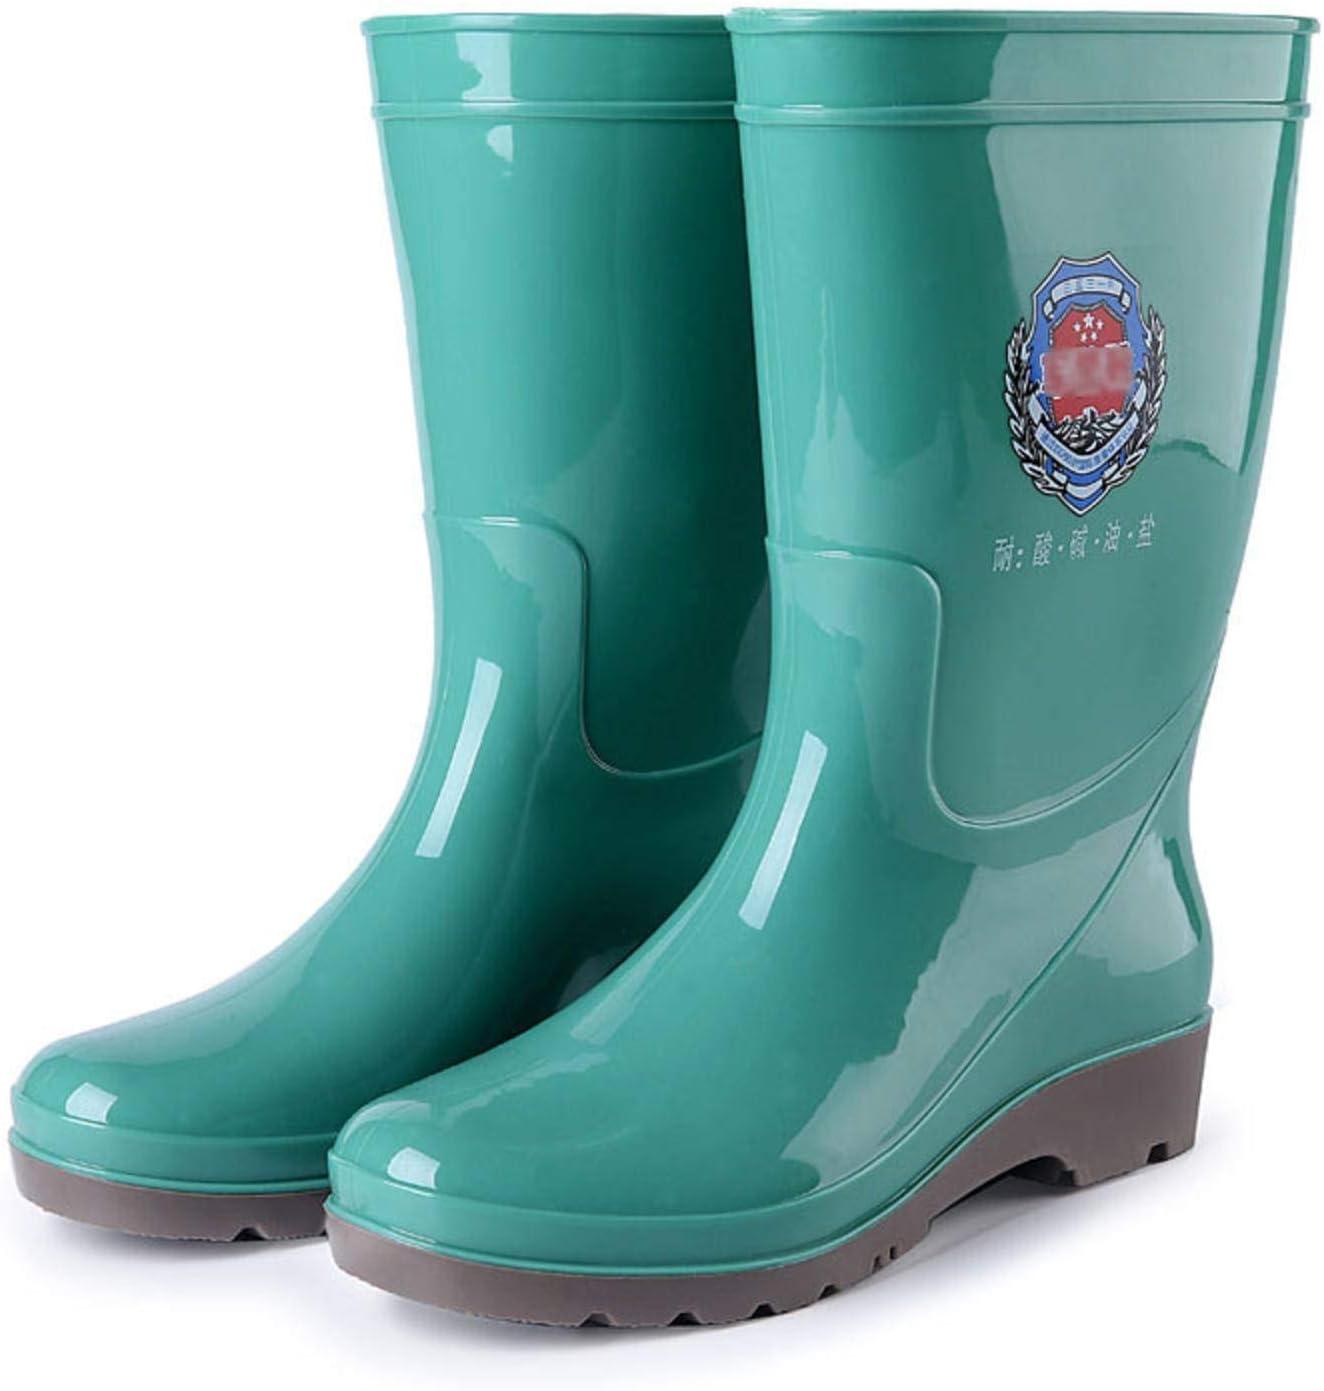 NC Women's Medium Tube Rain Boots Women's Work Protective Rain Boots Labor Protection Supplies Triple Resistant Rubber Boots